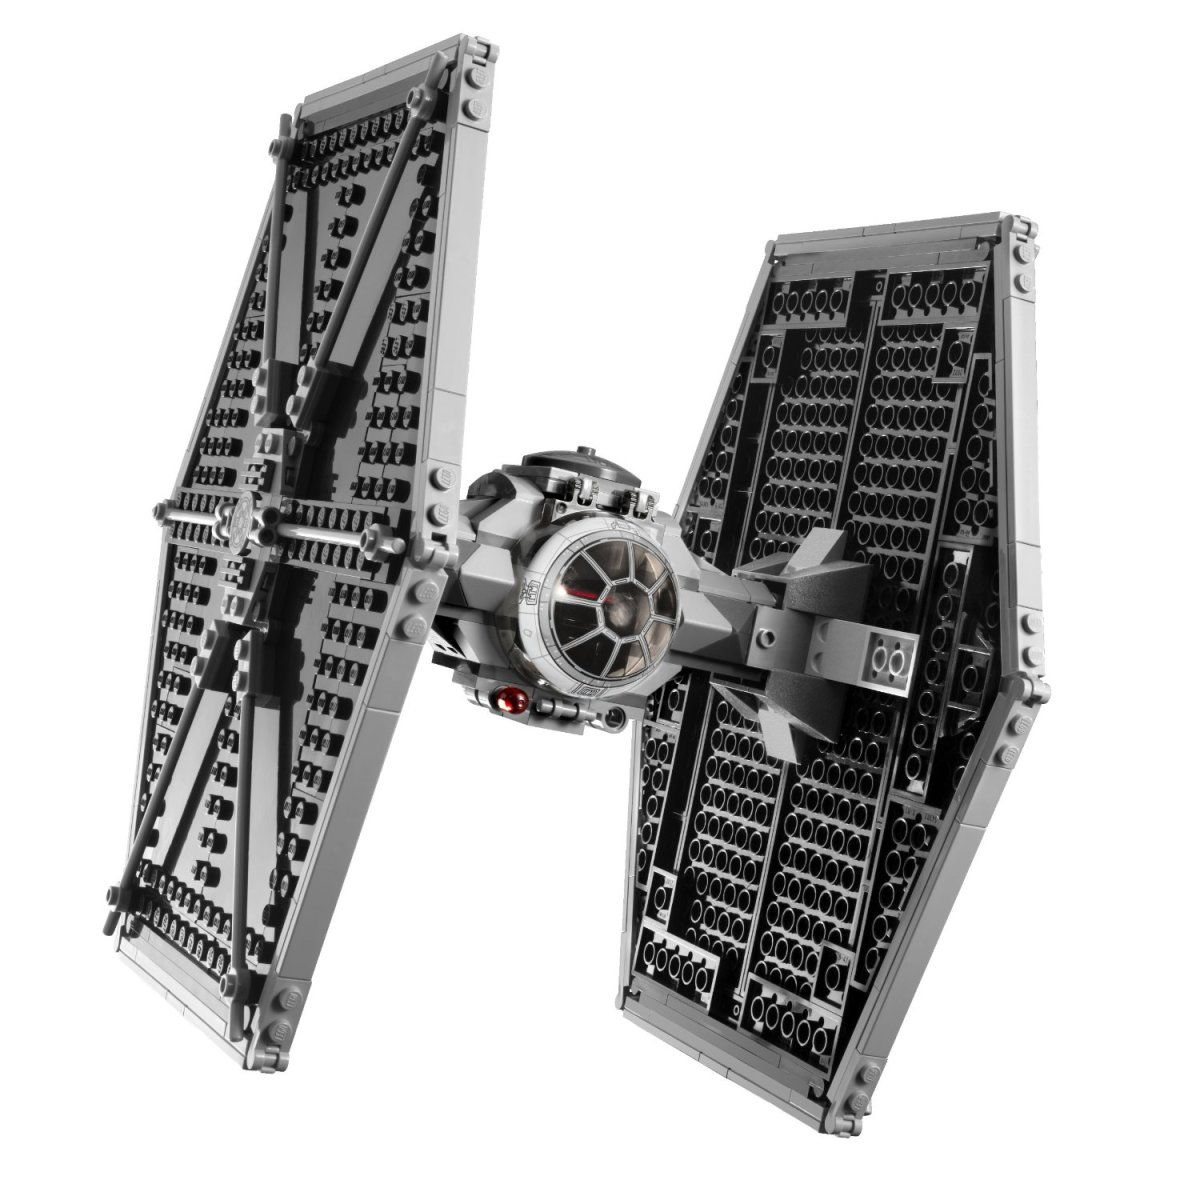 LEGO Star Wars TIE Fighter 9492 Assembled